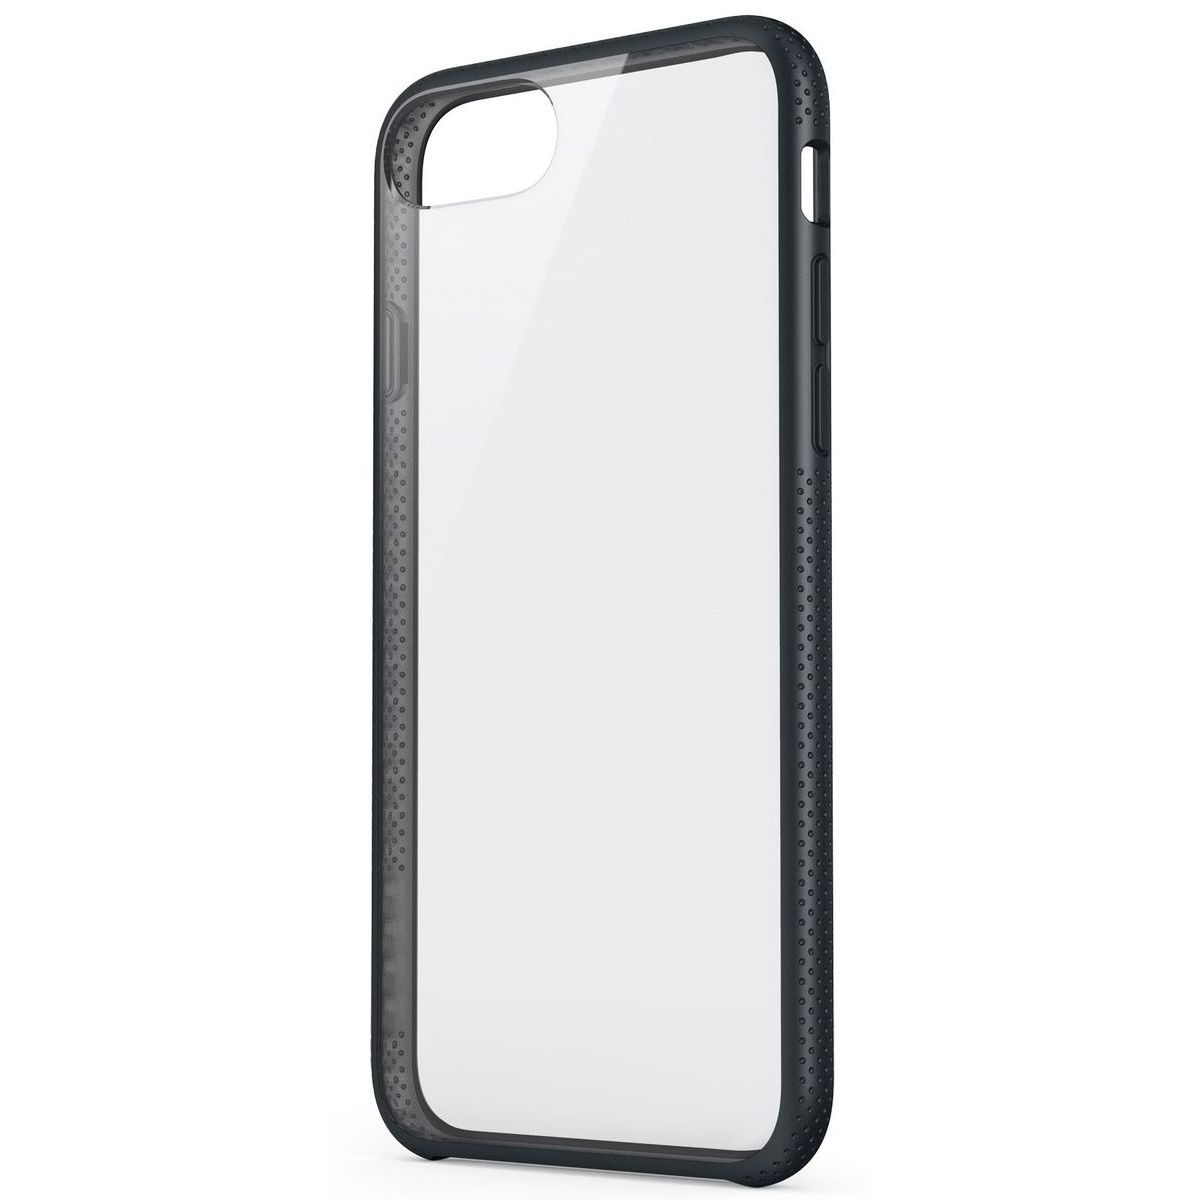 Belkin Handytasche »Air Protect SheerForce f?r Apple iPhone 7«